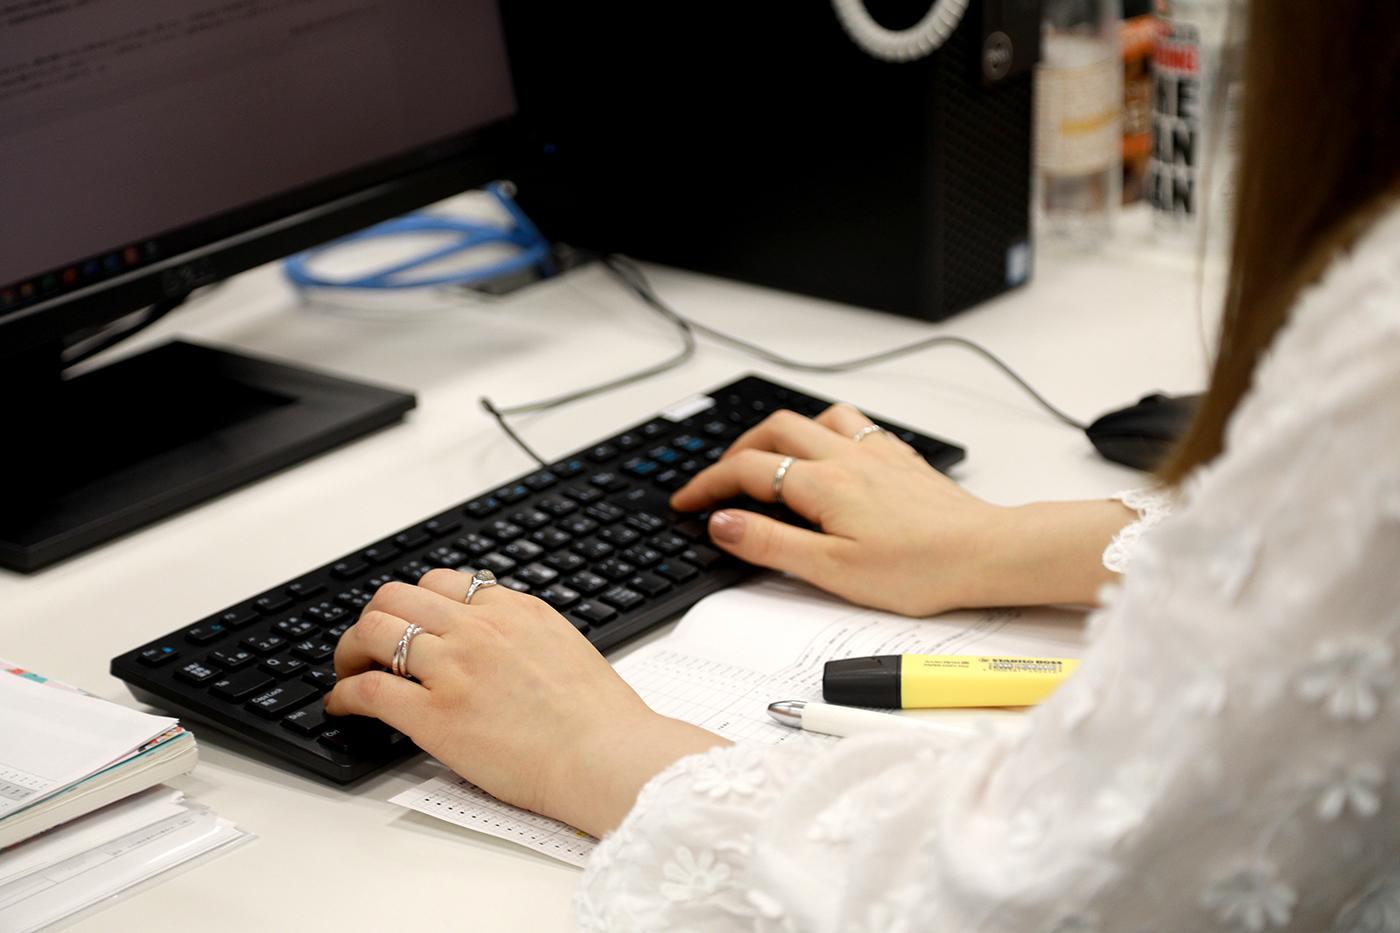 Viktoryia at work.